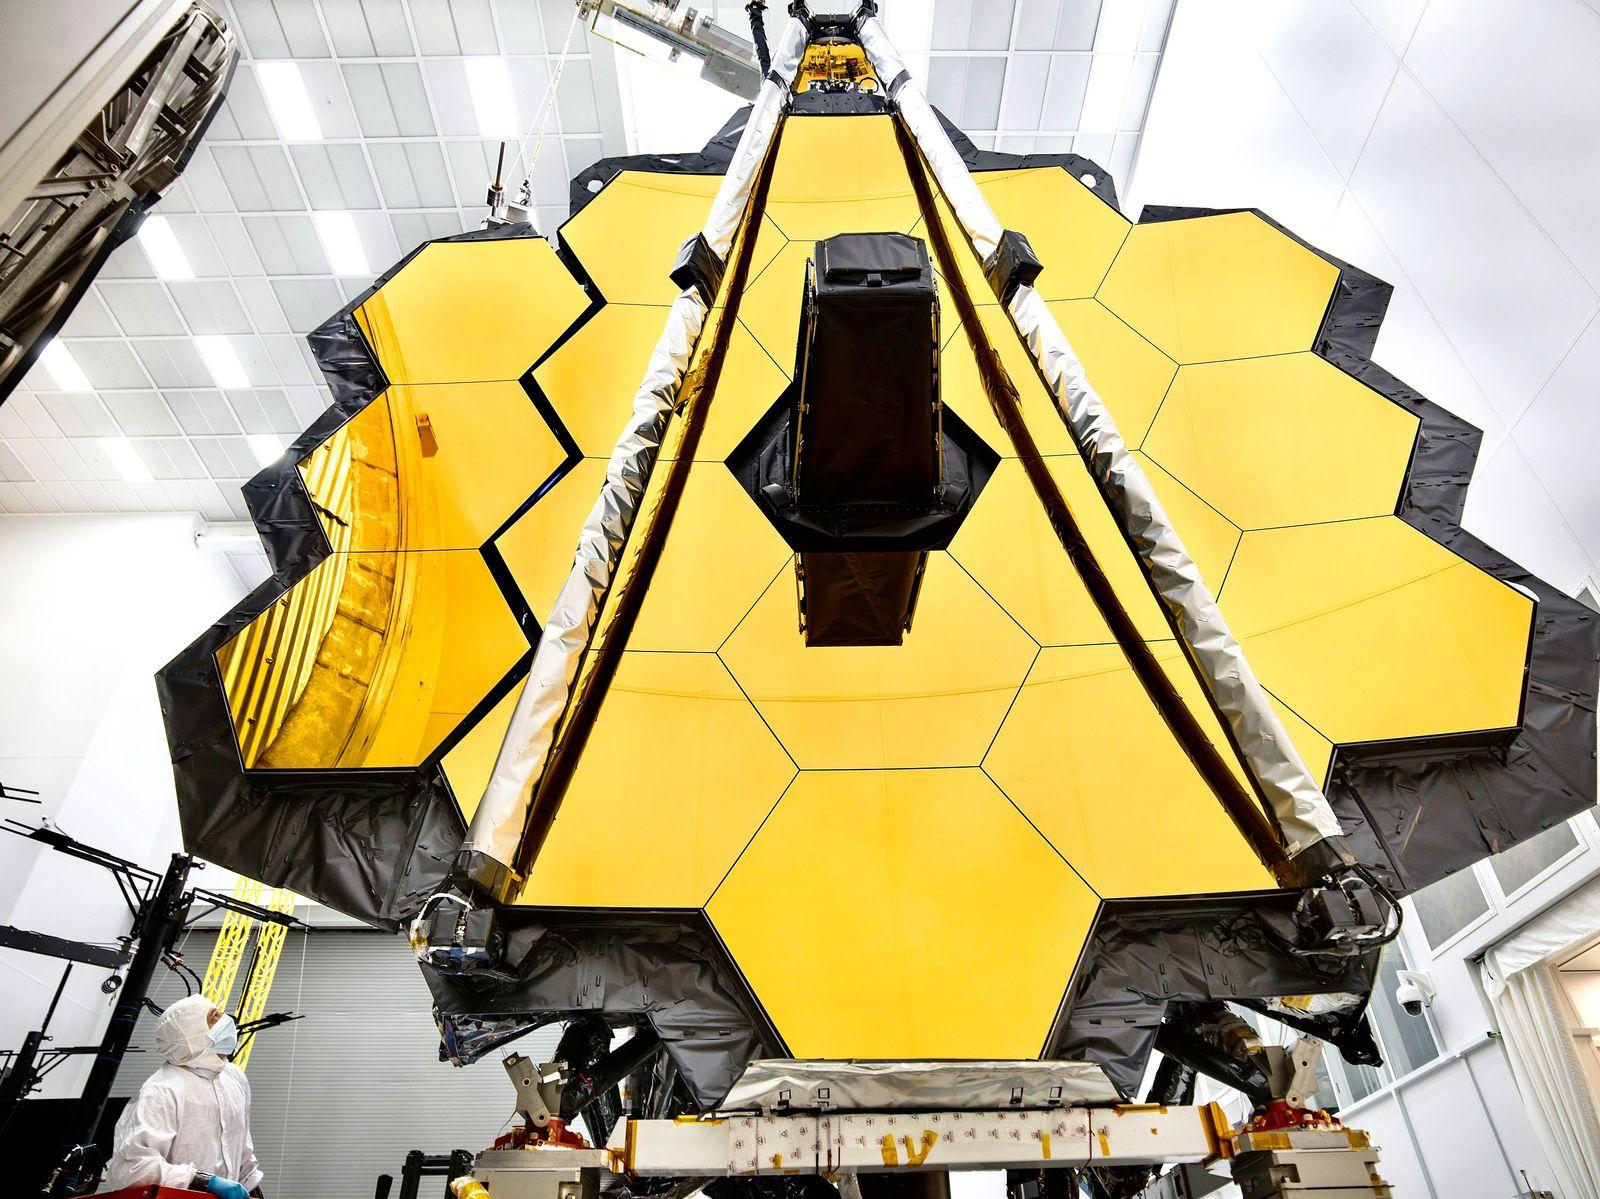 FILES-US-SCIENCE-AEROSPACE-ASTRONOMY